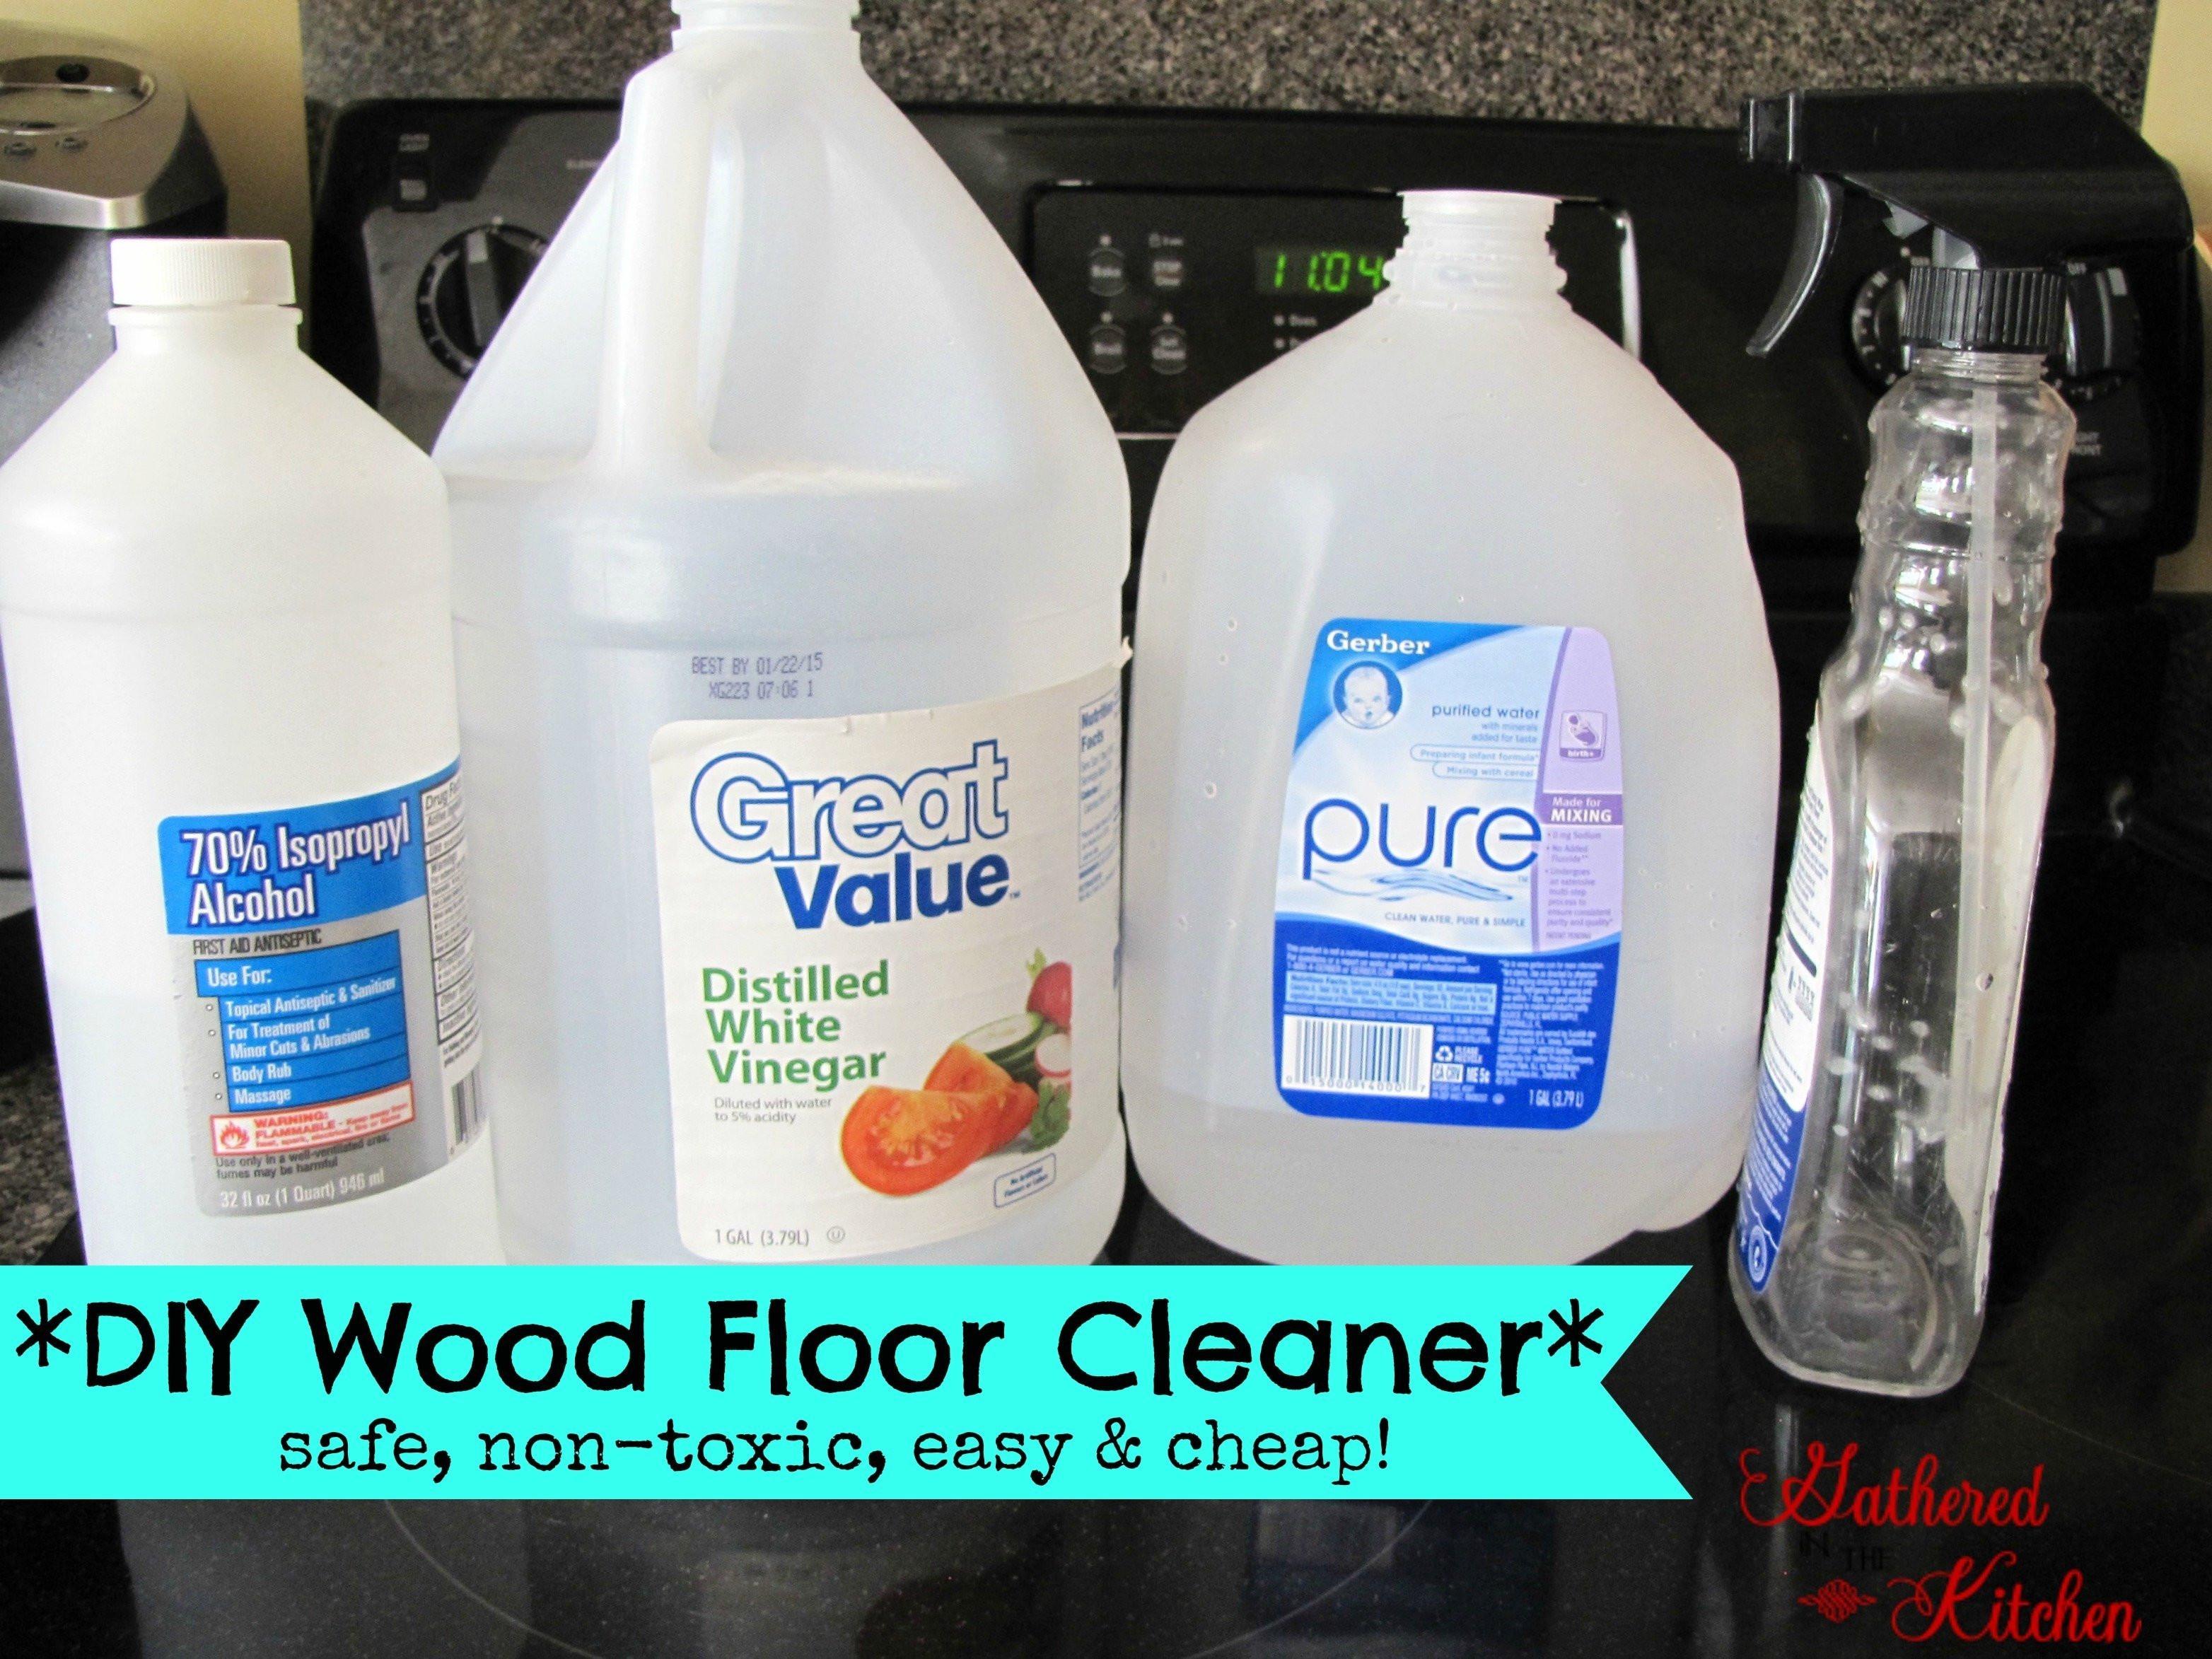 best cleaner for laminate hardwood floors of wash laminate floors with vinegar image collections cheap laminate within wash laminate floors with vinegar image collections cheap laminate